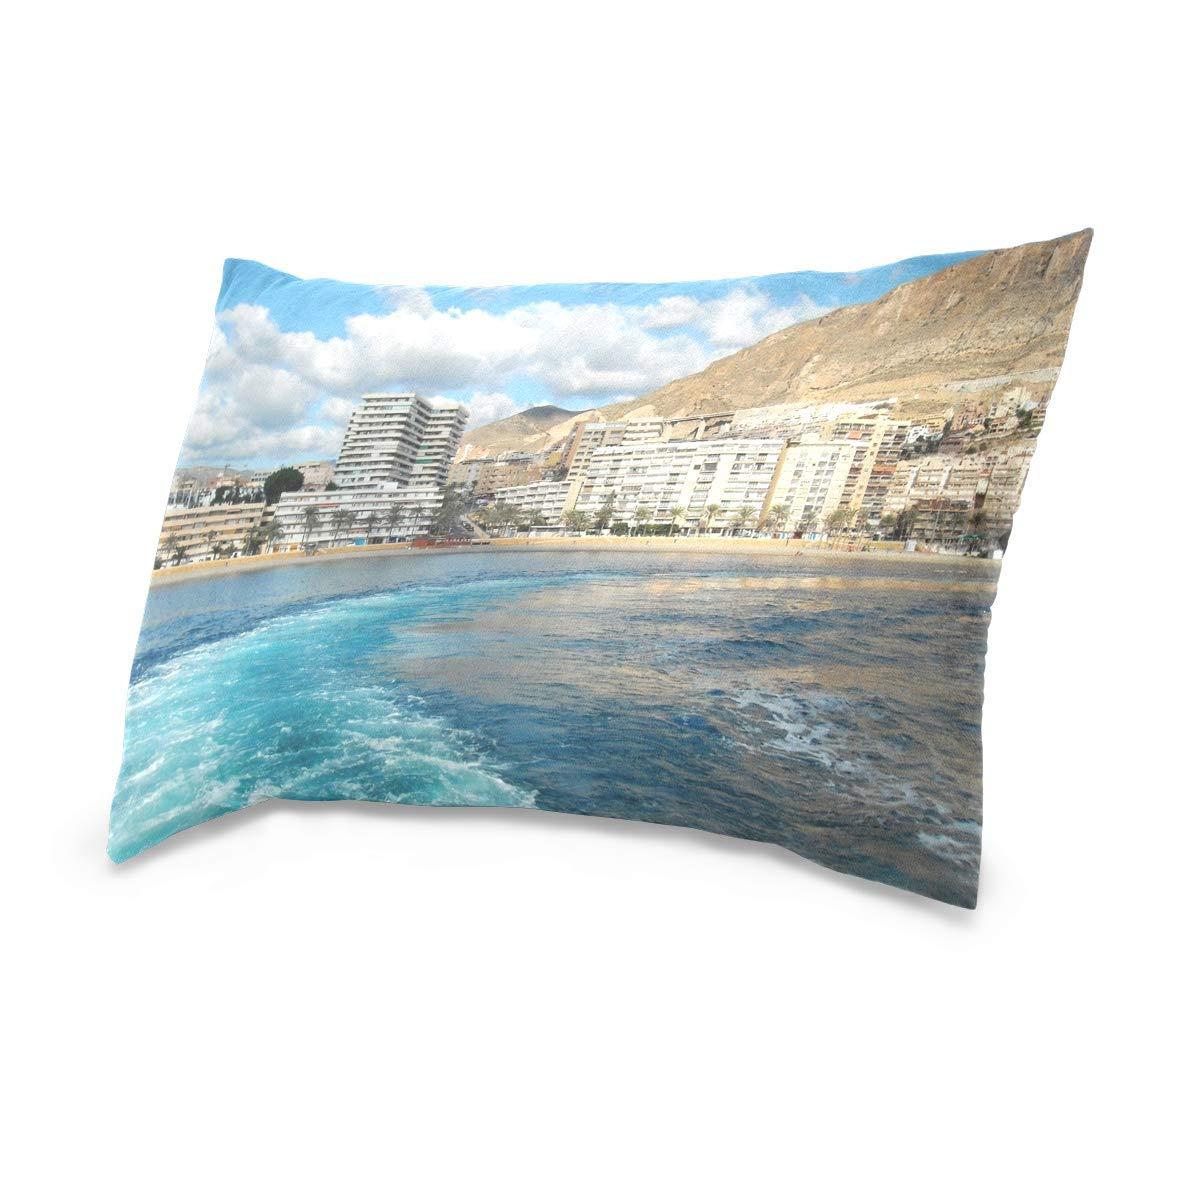 Gxdchfj Aguadulce Almeria Fashion Throw Almohada Cover with ...